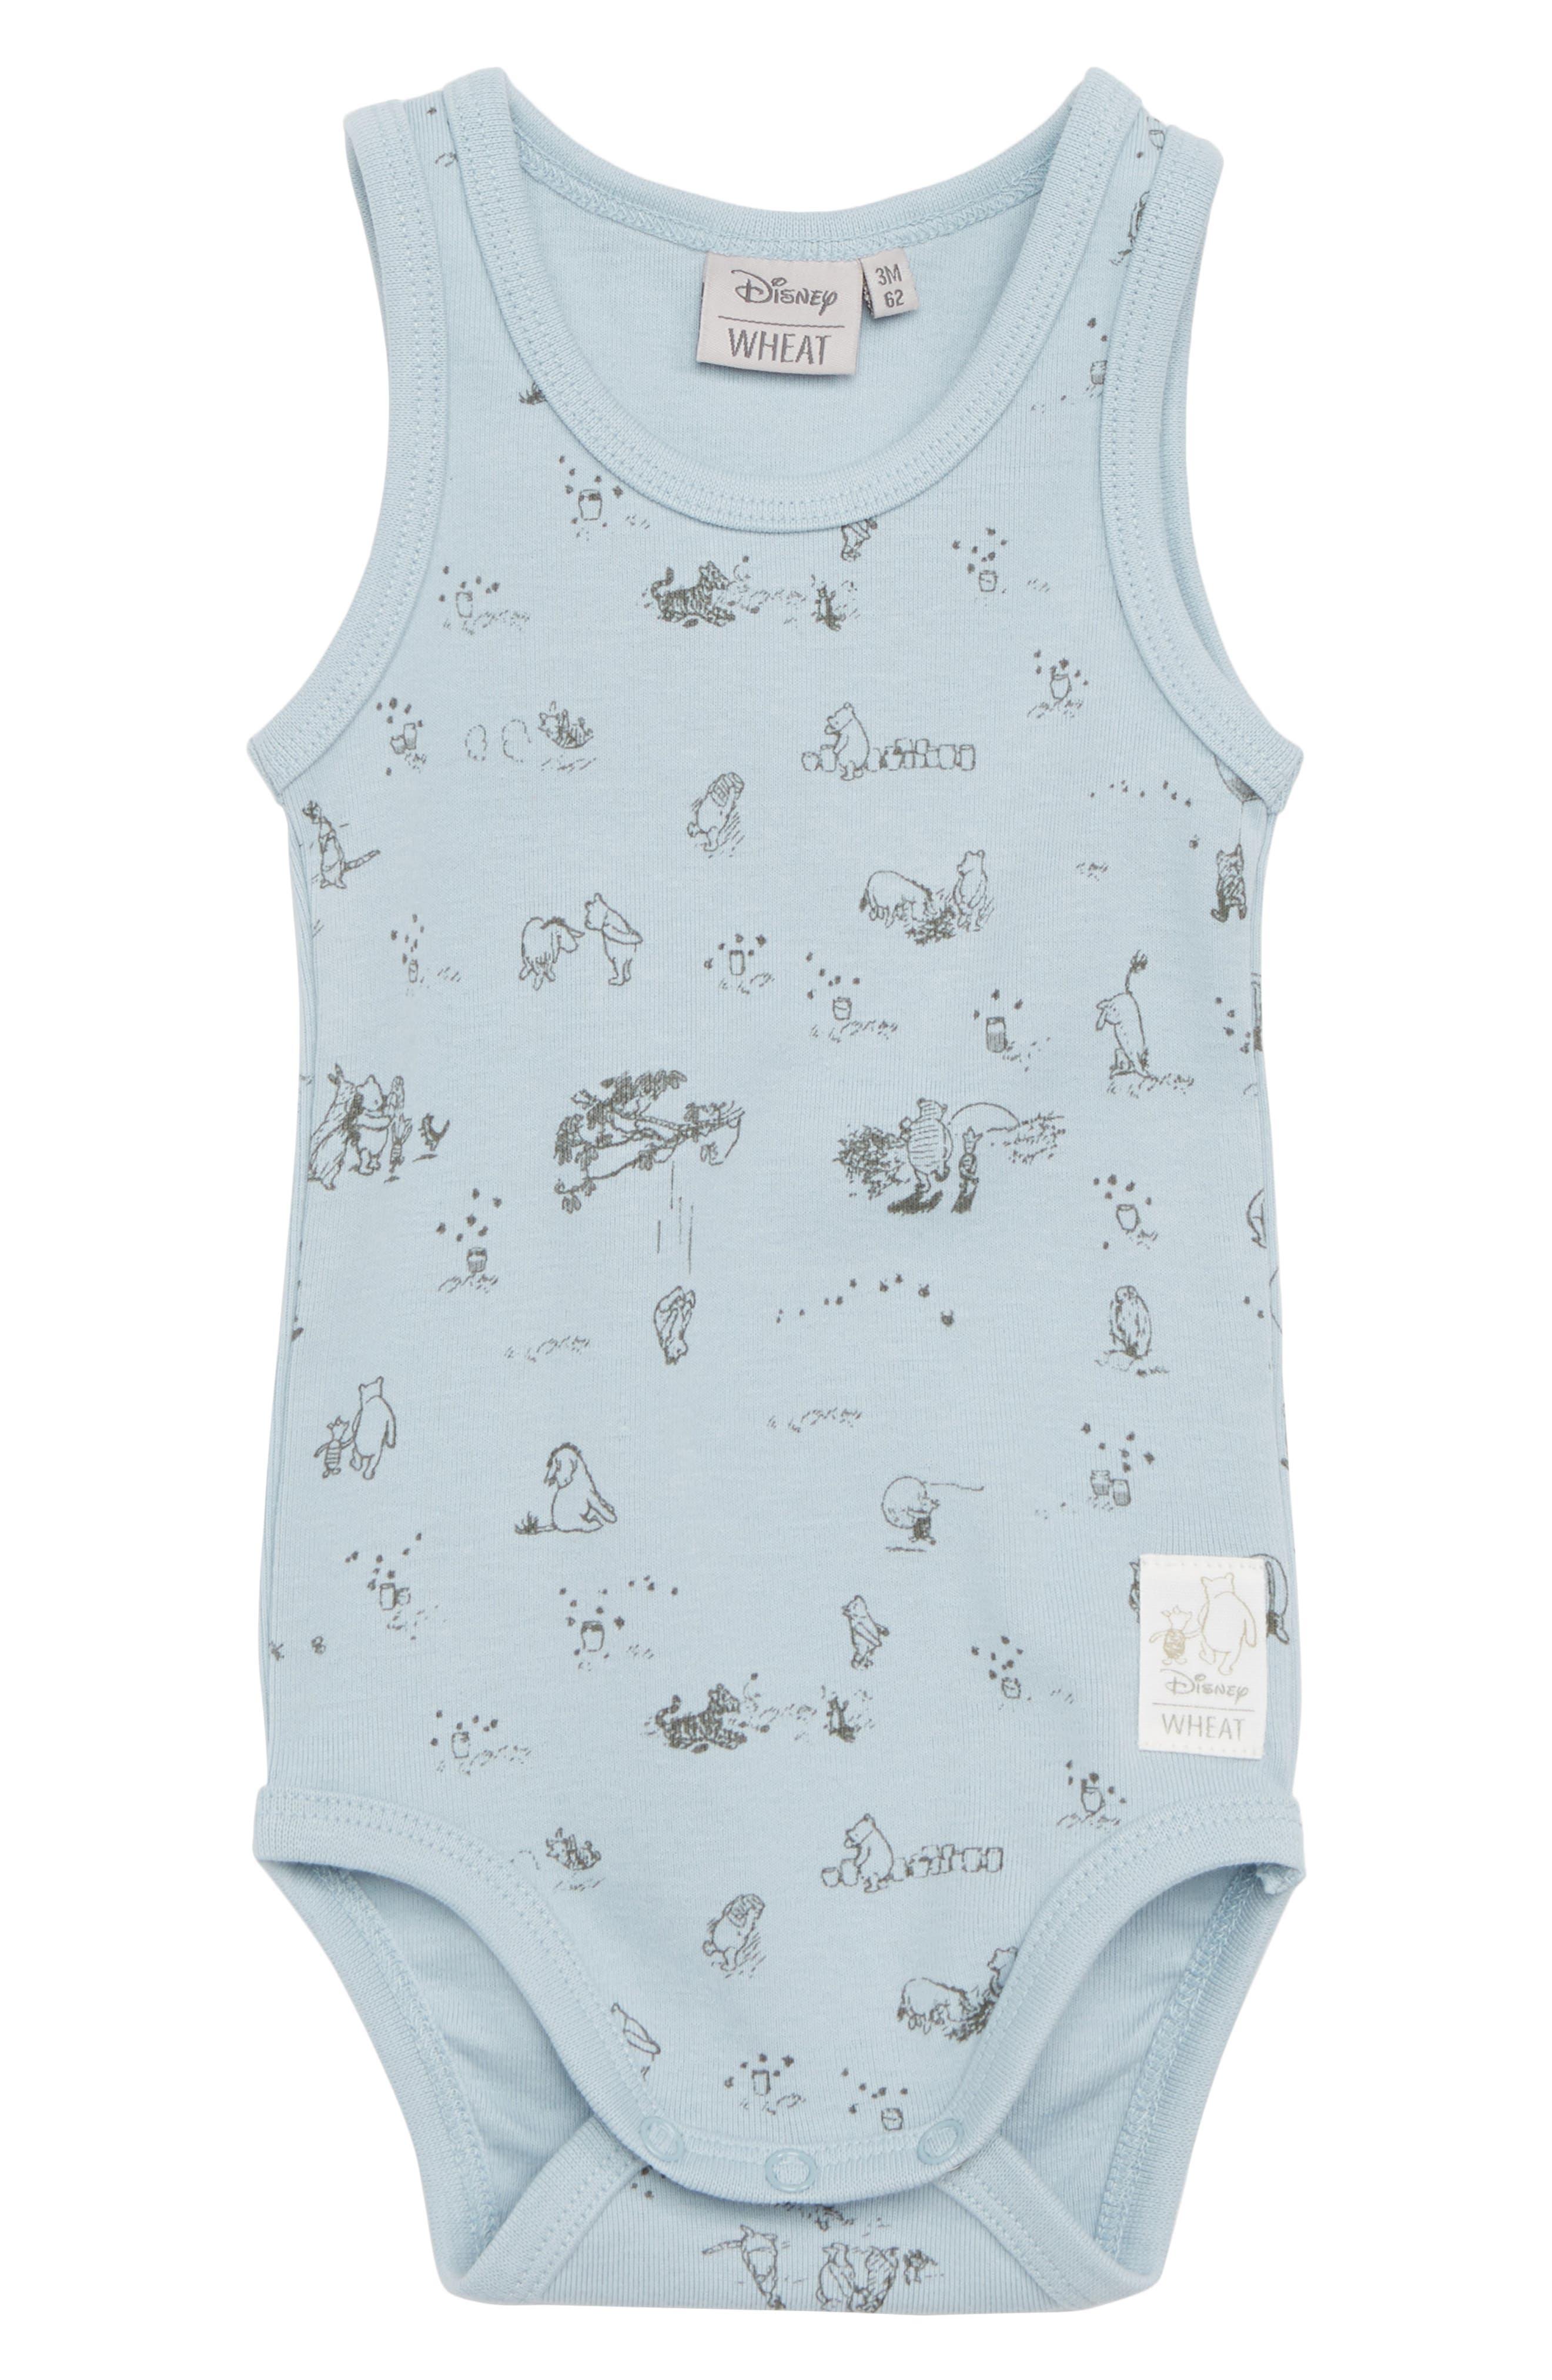 x Disney<sup>®</sup> Winnie the Pooh Organic Cotton Bodysuit,                             Main thumbnail 1, color,                             402